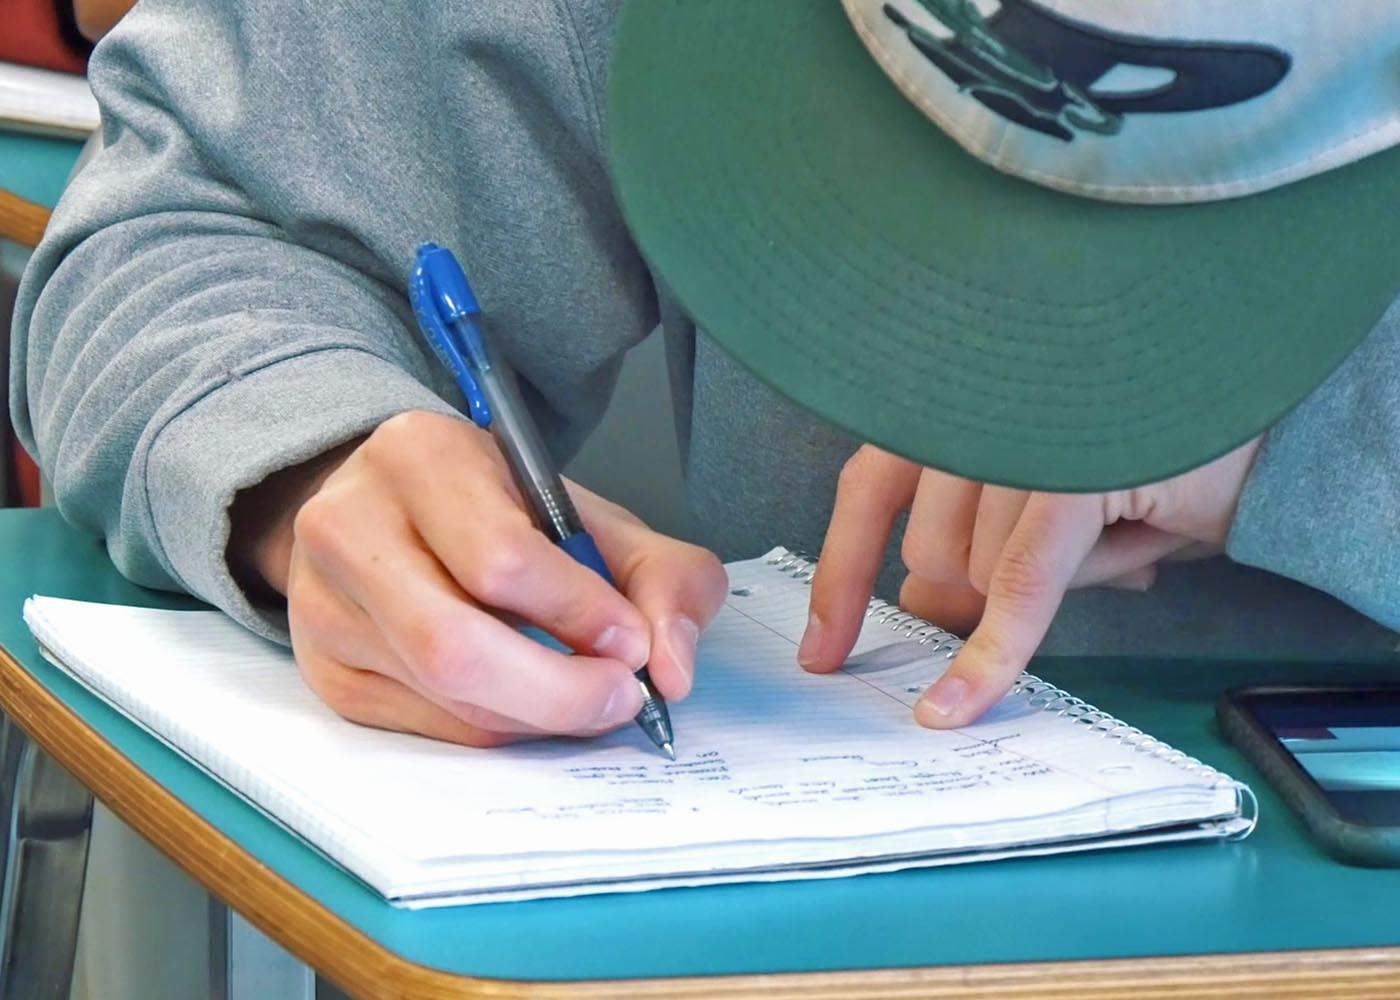 Explore Writing at WPU